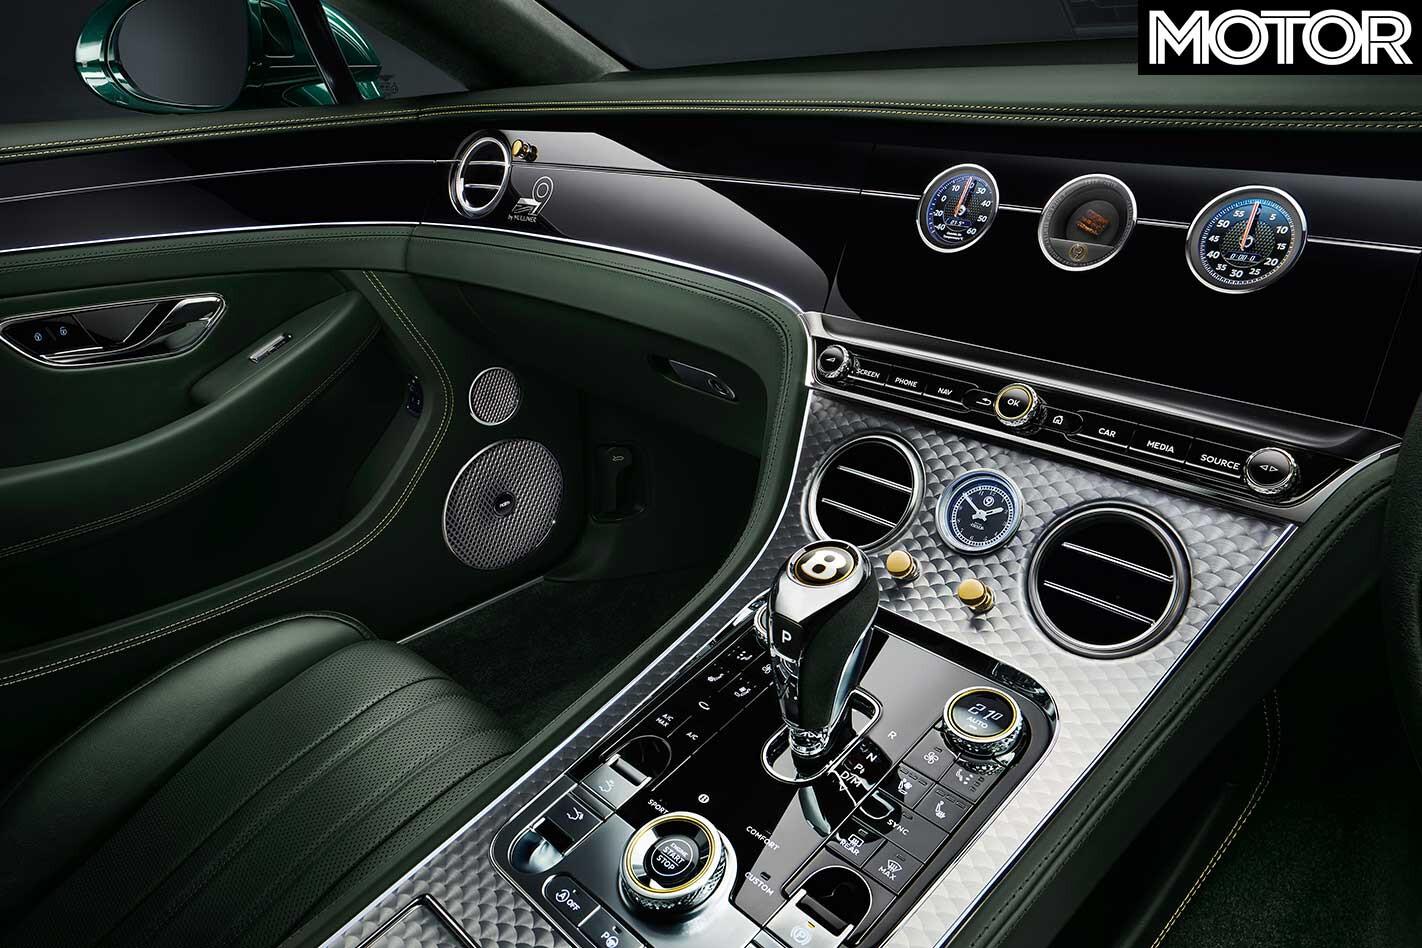 2019 Bentley Continental GT Number 9 Edition Interior Jpg